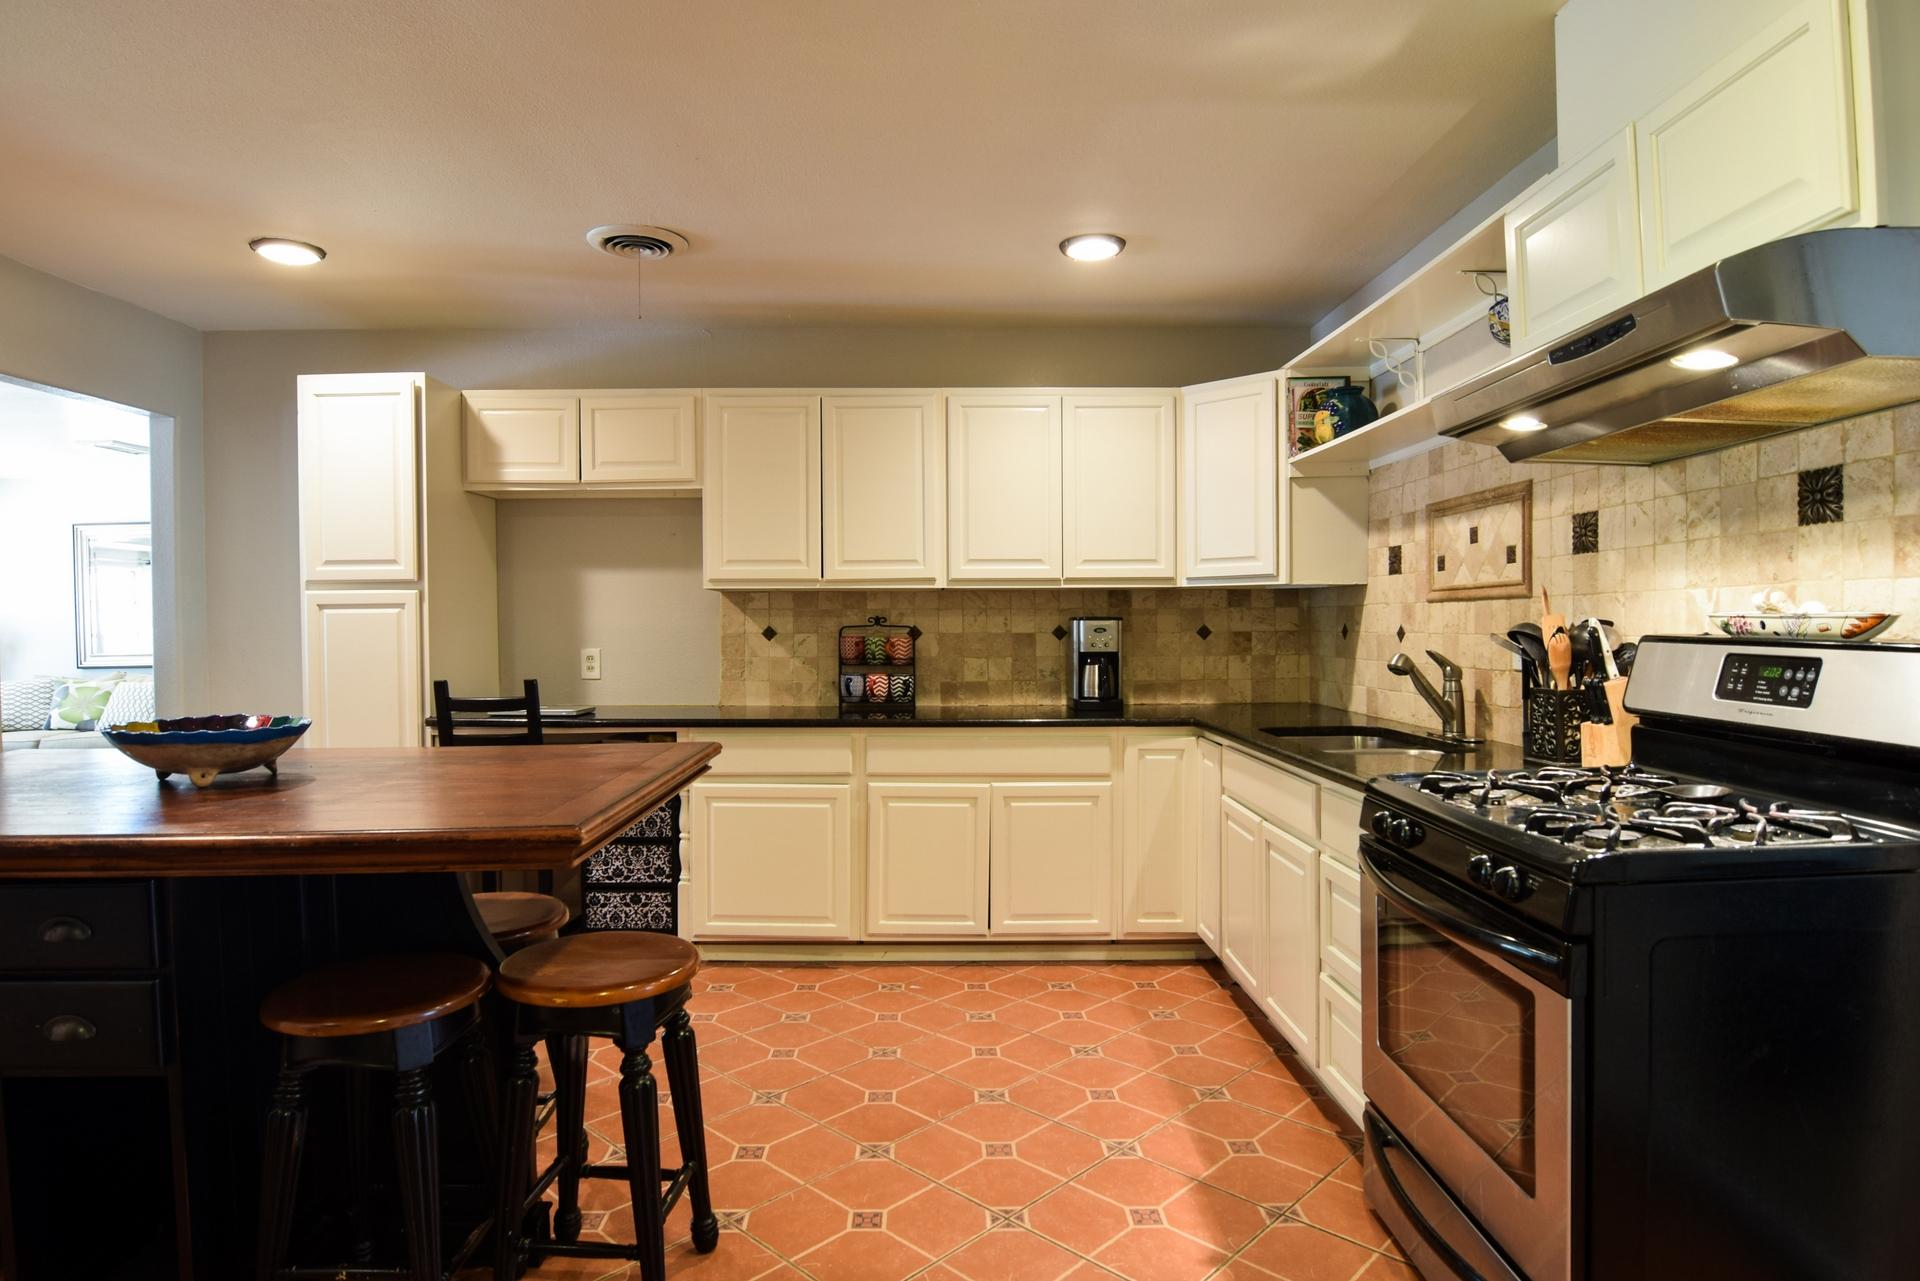 Kitchen3 3112 Catamore Dr Dallas TX 75229.jpg